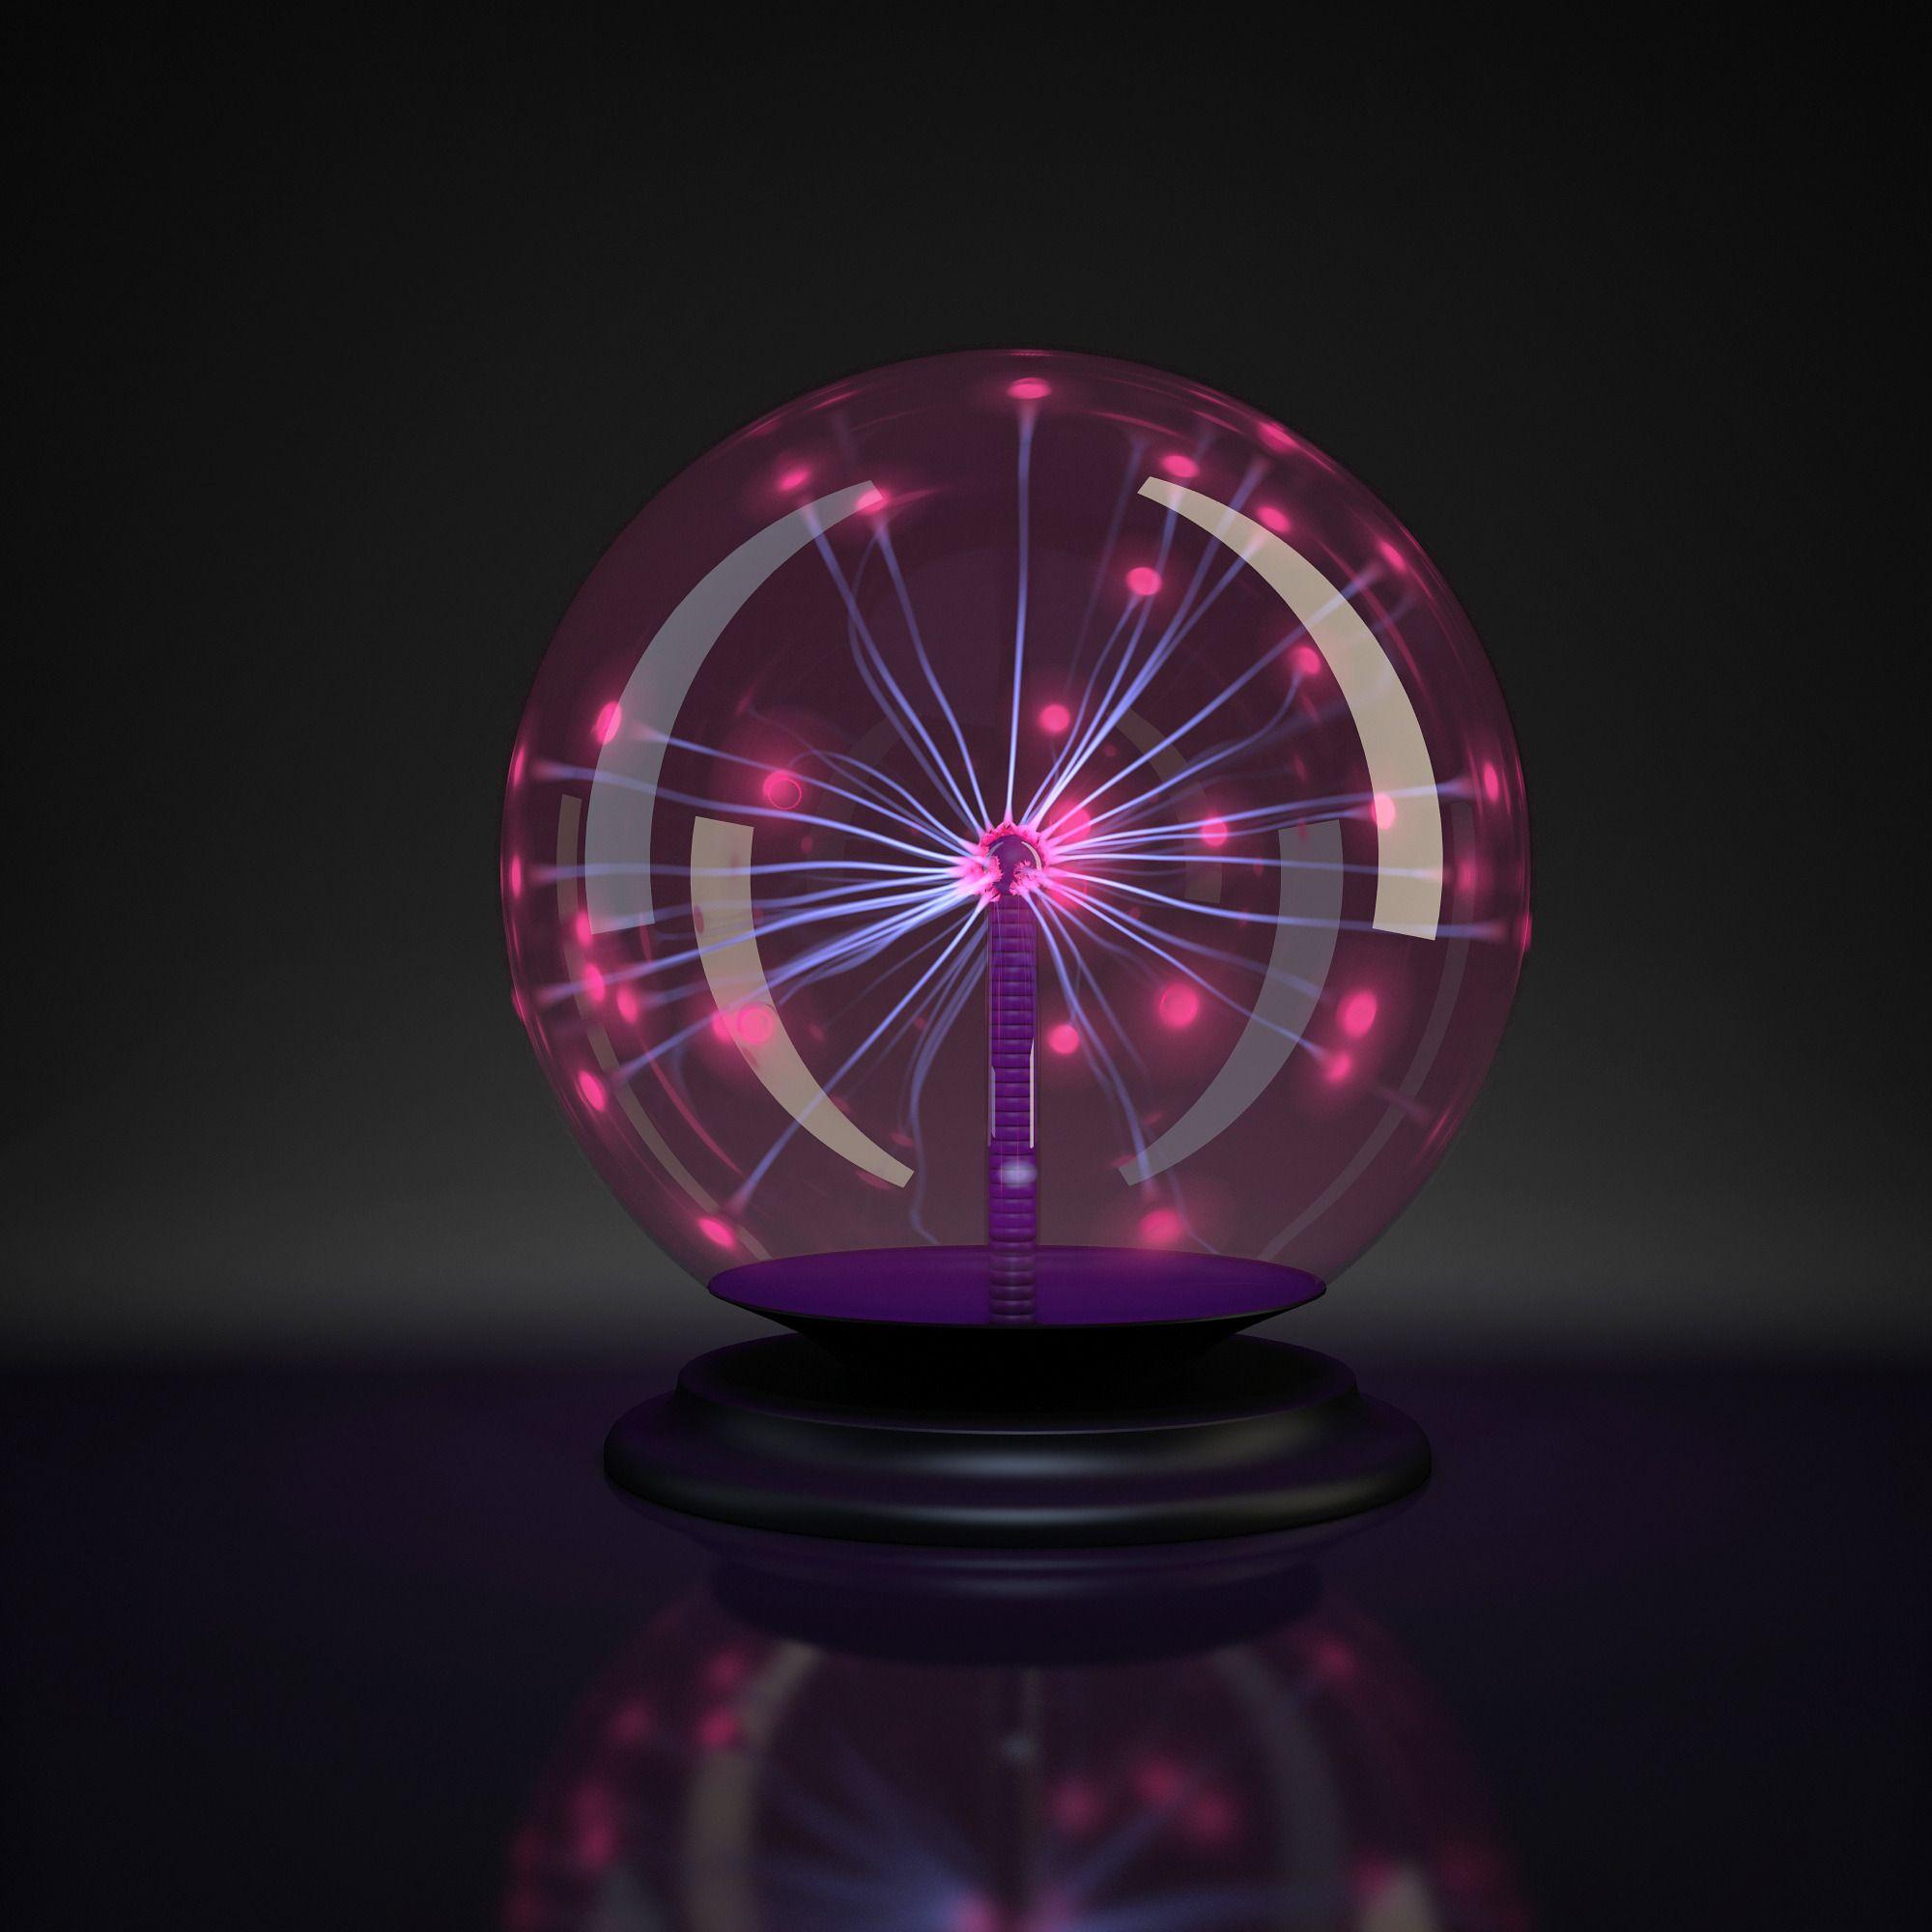 Plasma Ball Plasma Ball Globe Lamps Lamp Plasma